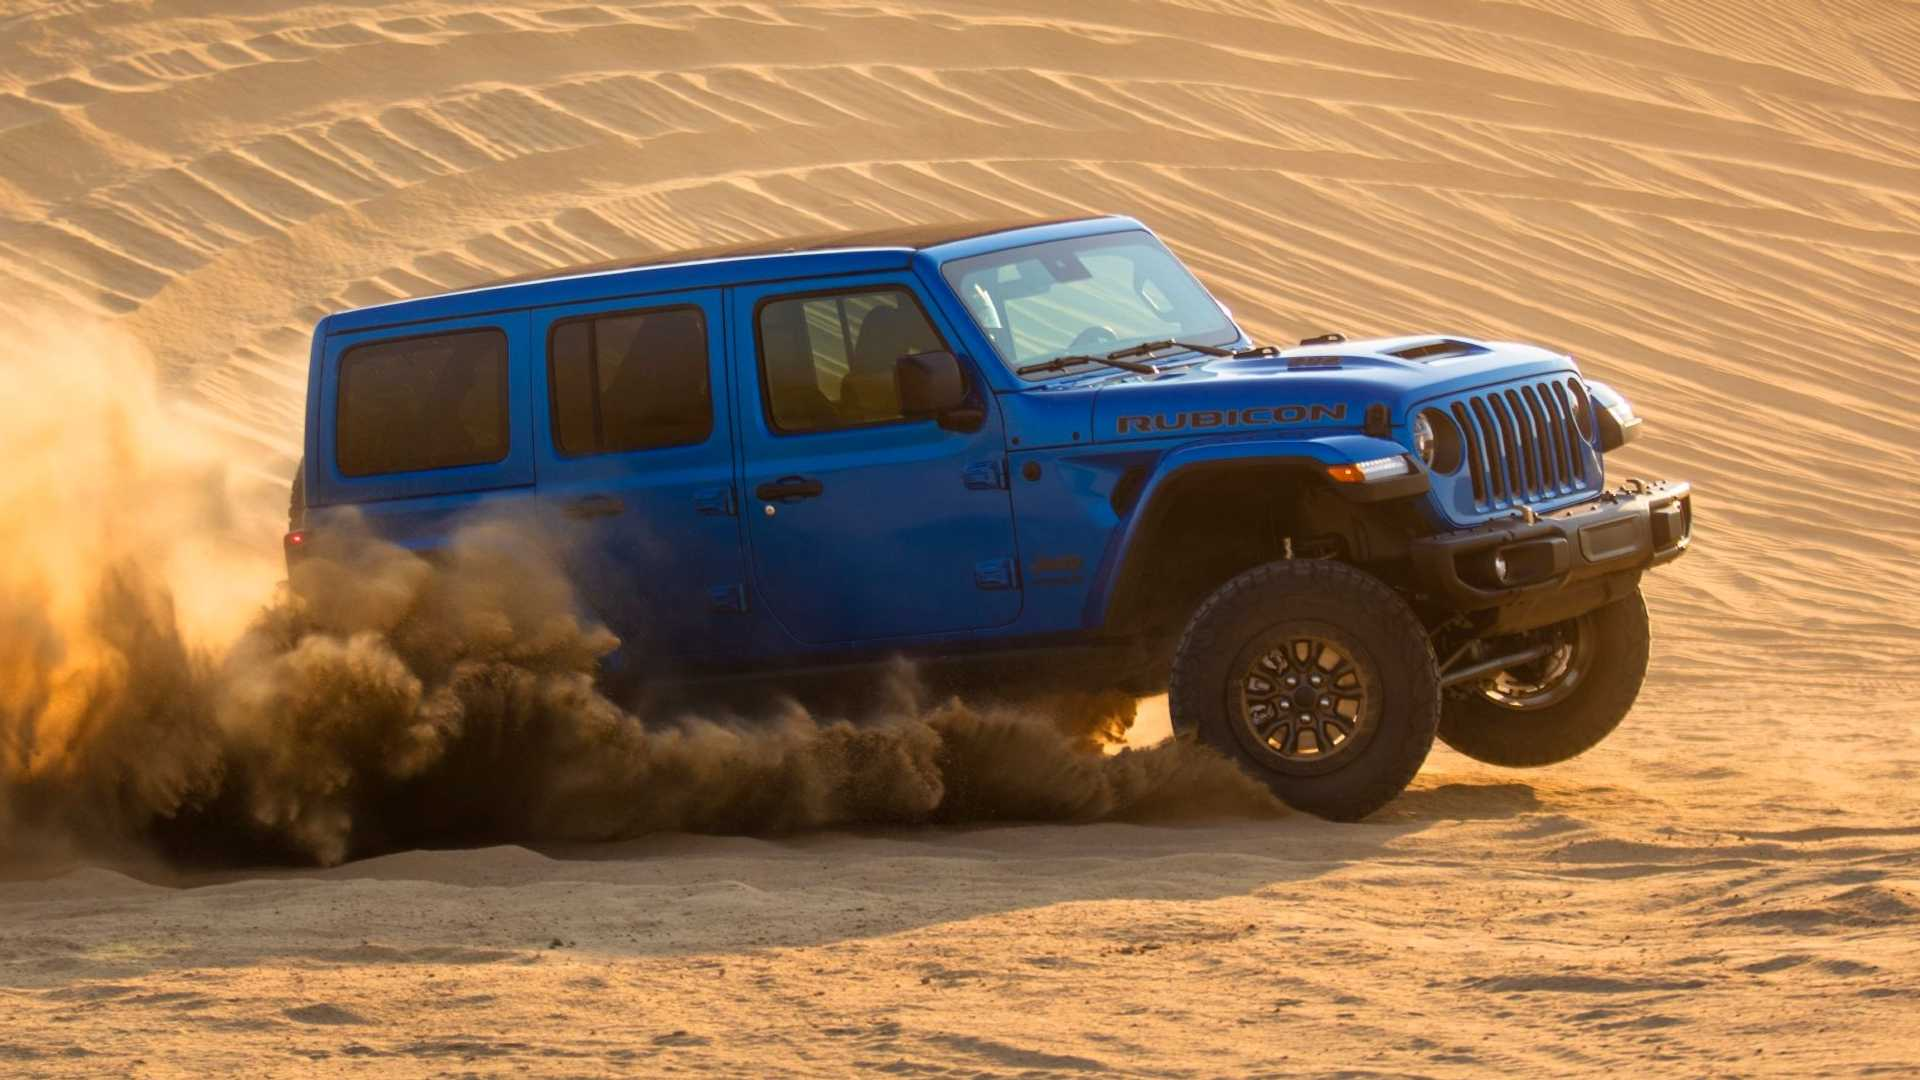 2021-jeep-wrangler-rubicon-392-side-view-4